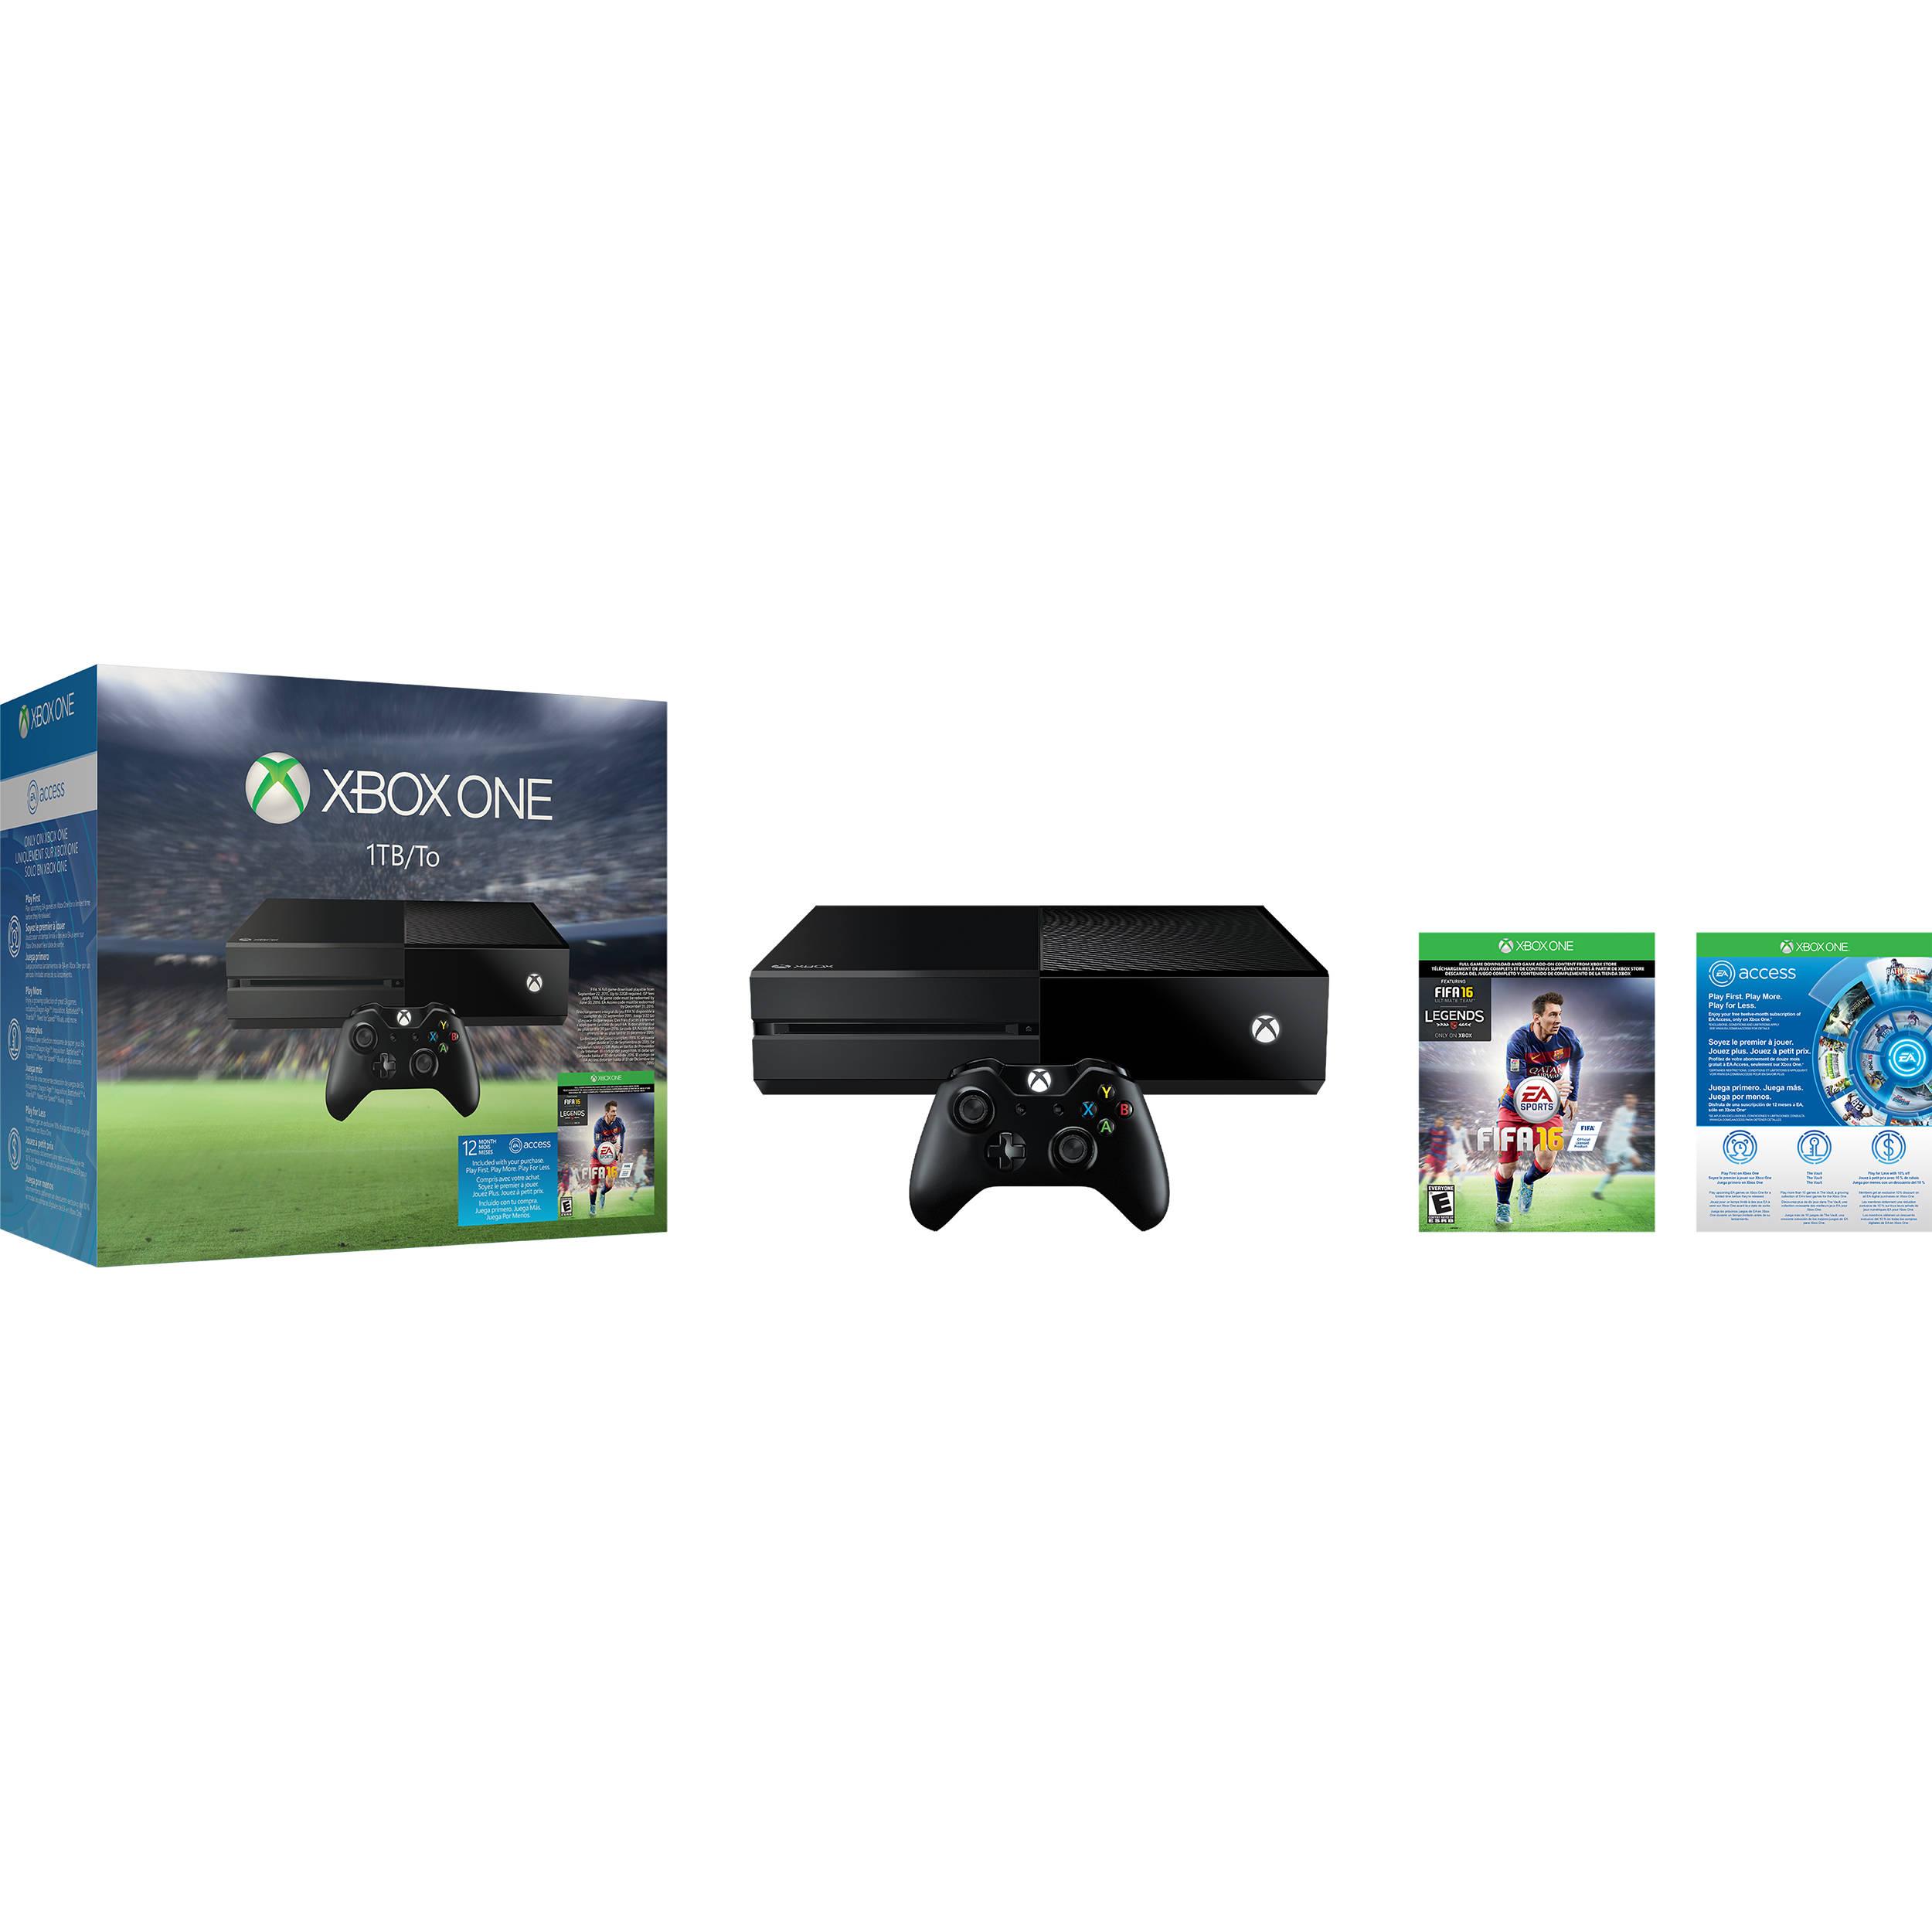 Xbox One Needs Kinect Microsoft Kf Xbox Tb Console Halo